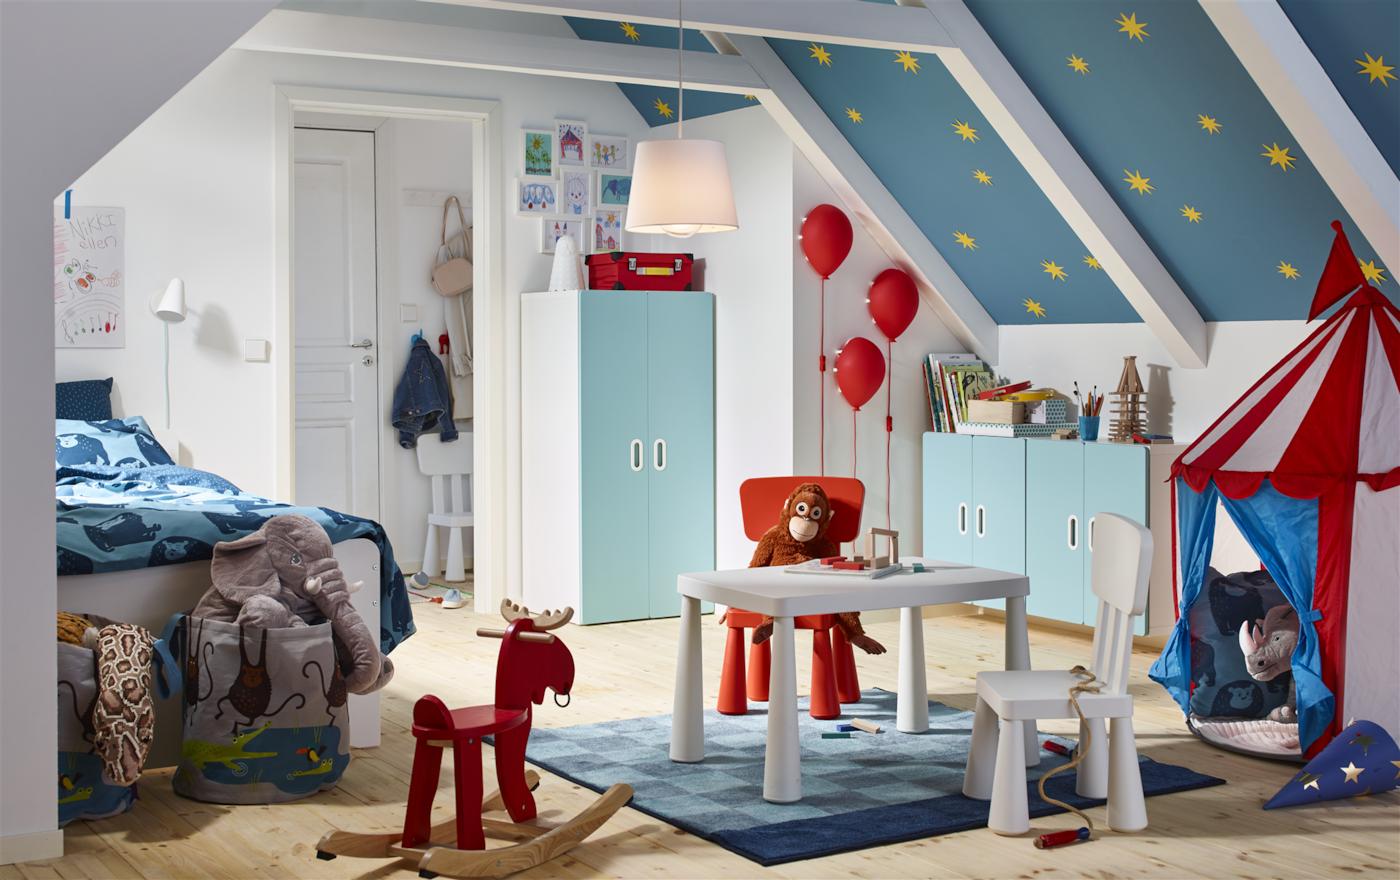 Elegant Kinderzimmer. Kinderzimmer IKEA